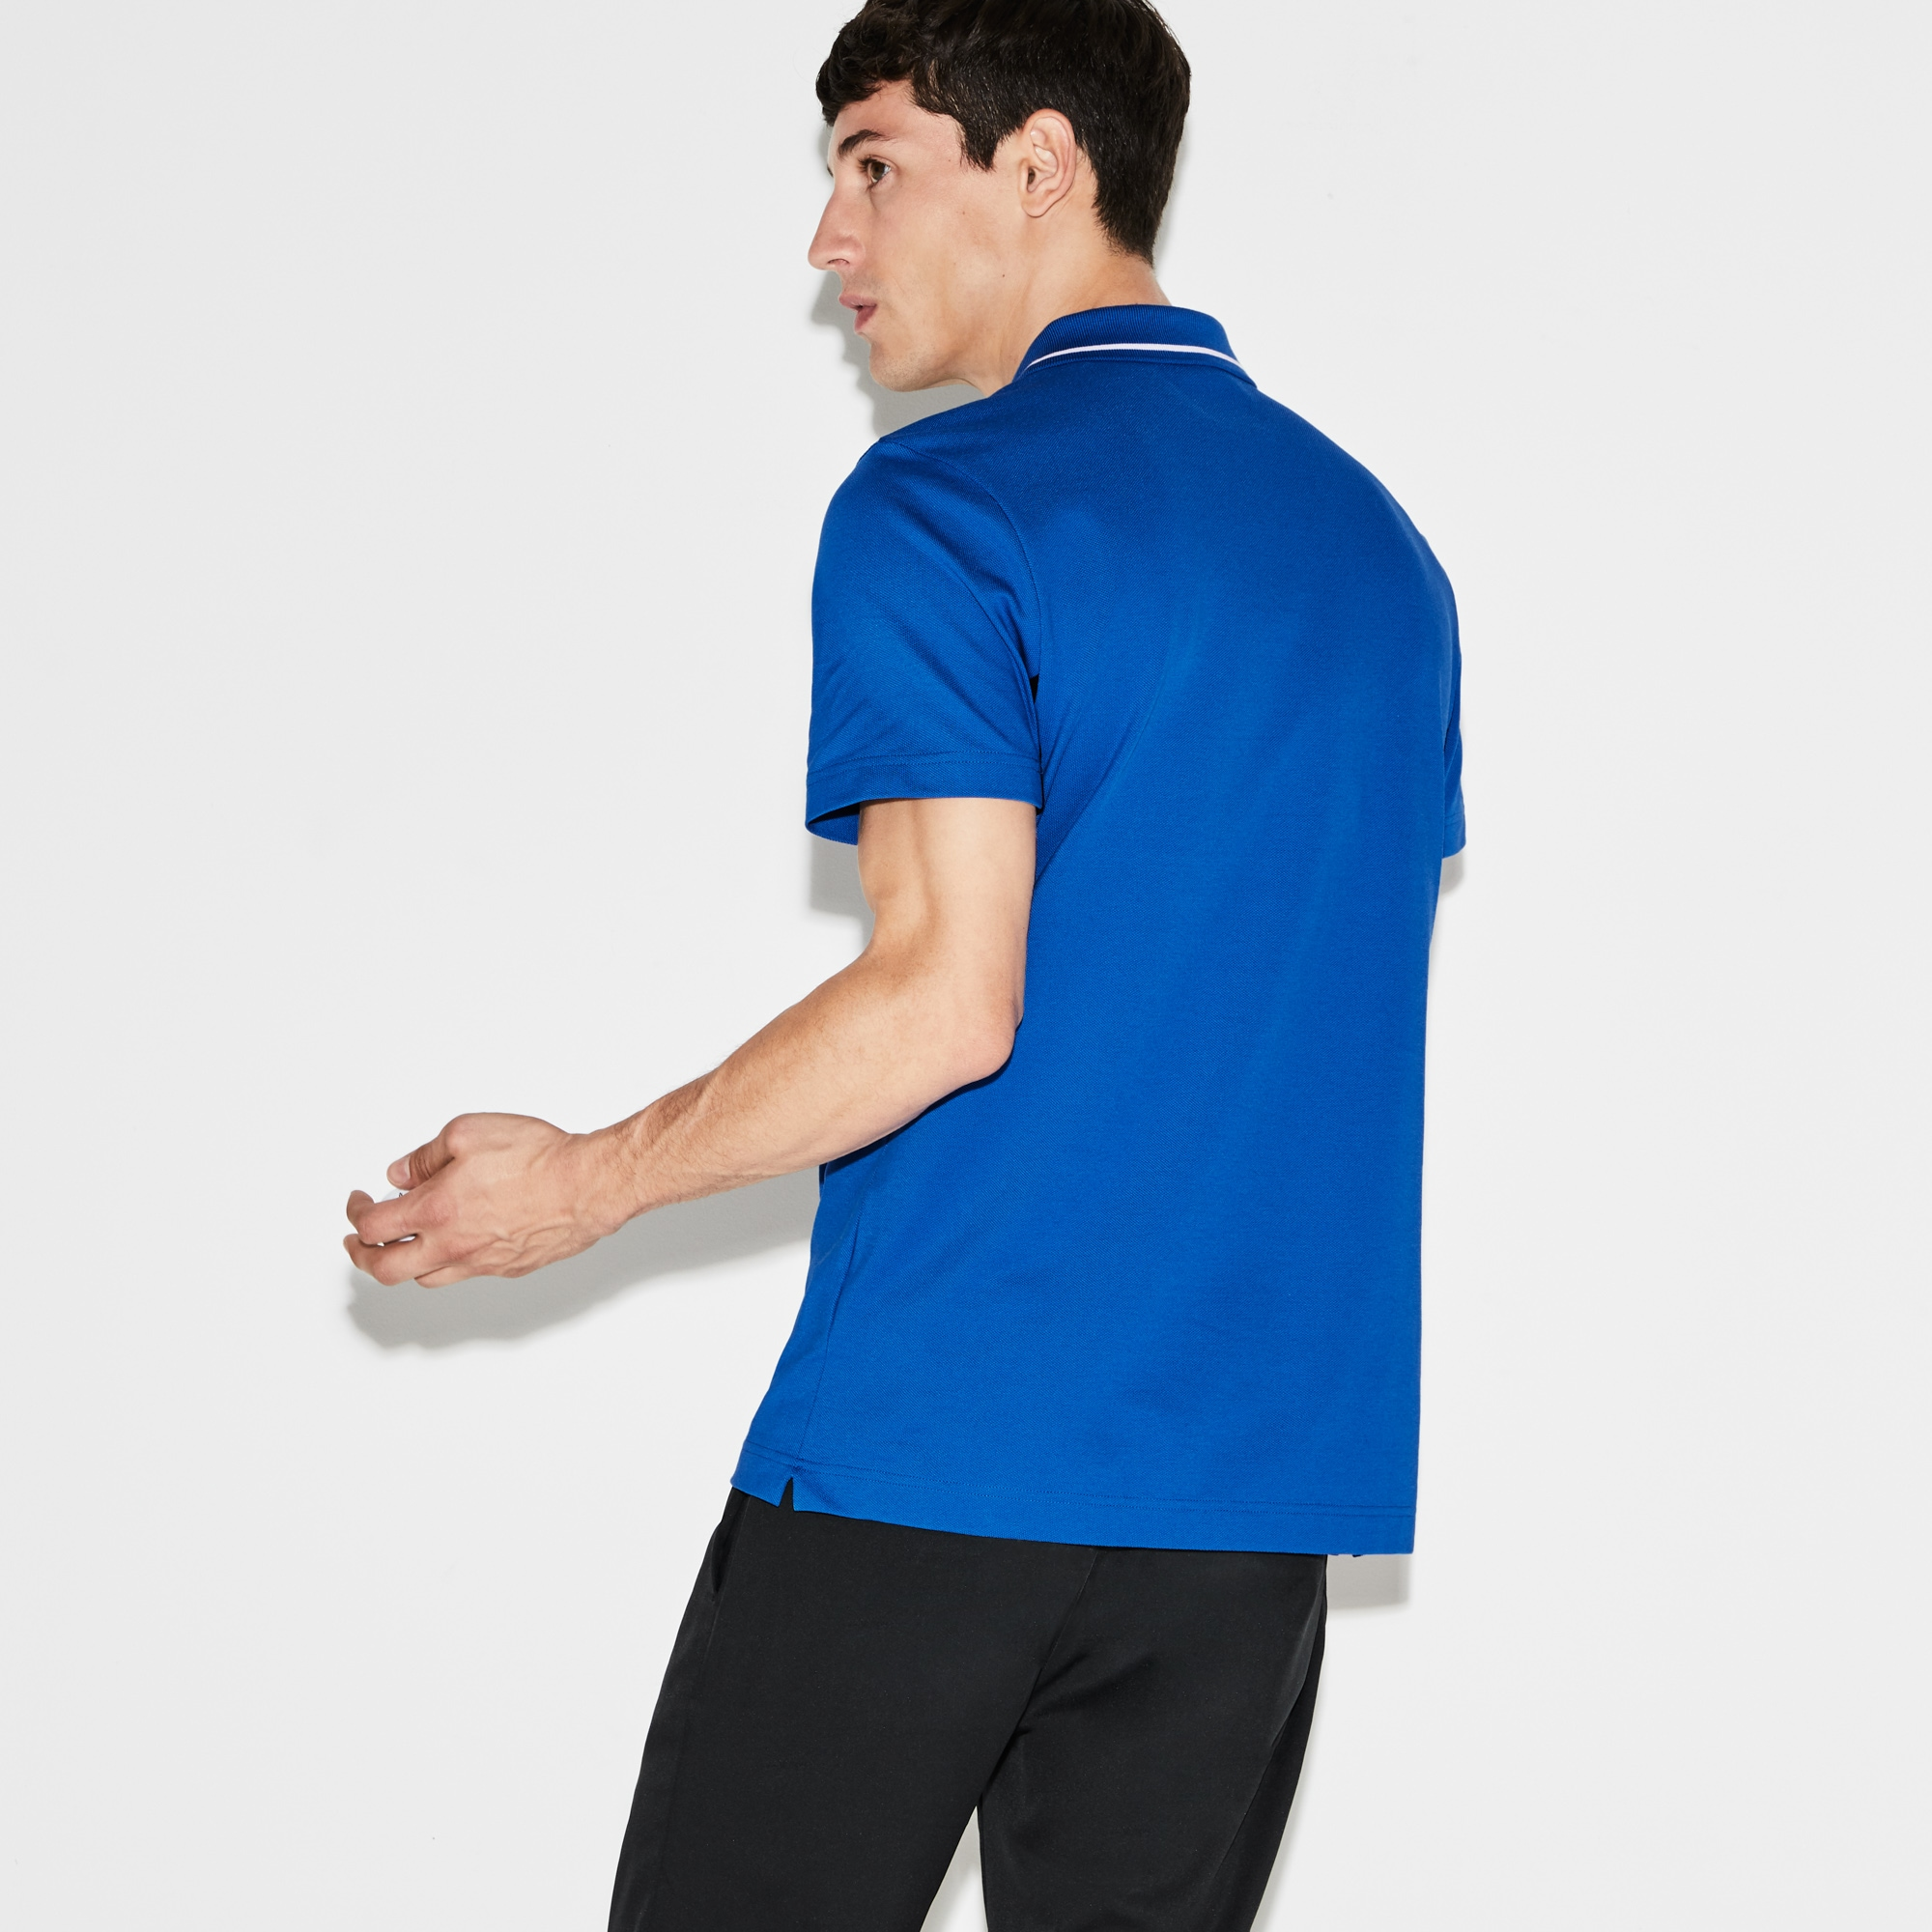 Lacoste - Herren LACOSTE SPORT Tennis-Poloshirt aus Funktionspiqué - 2